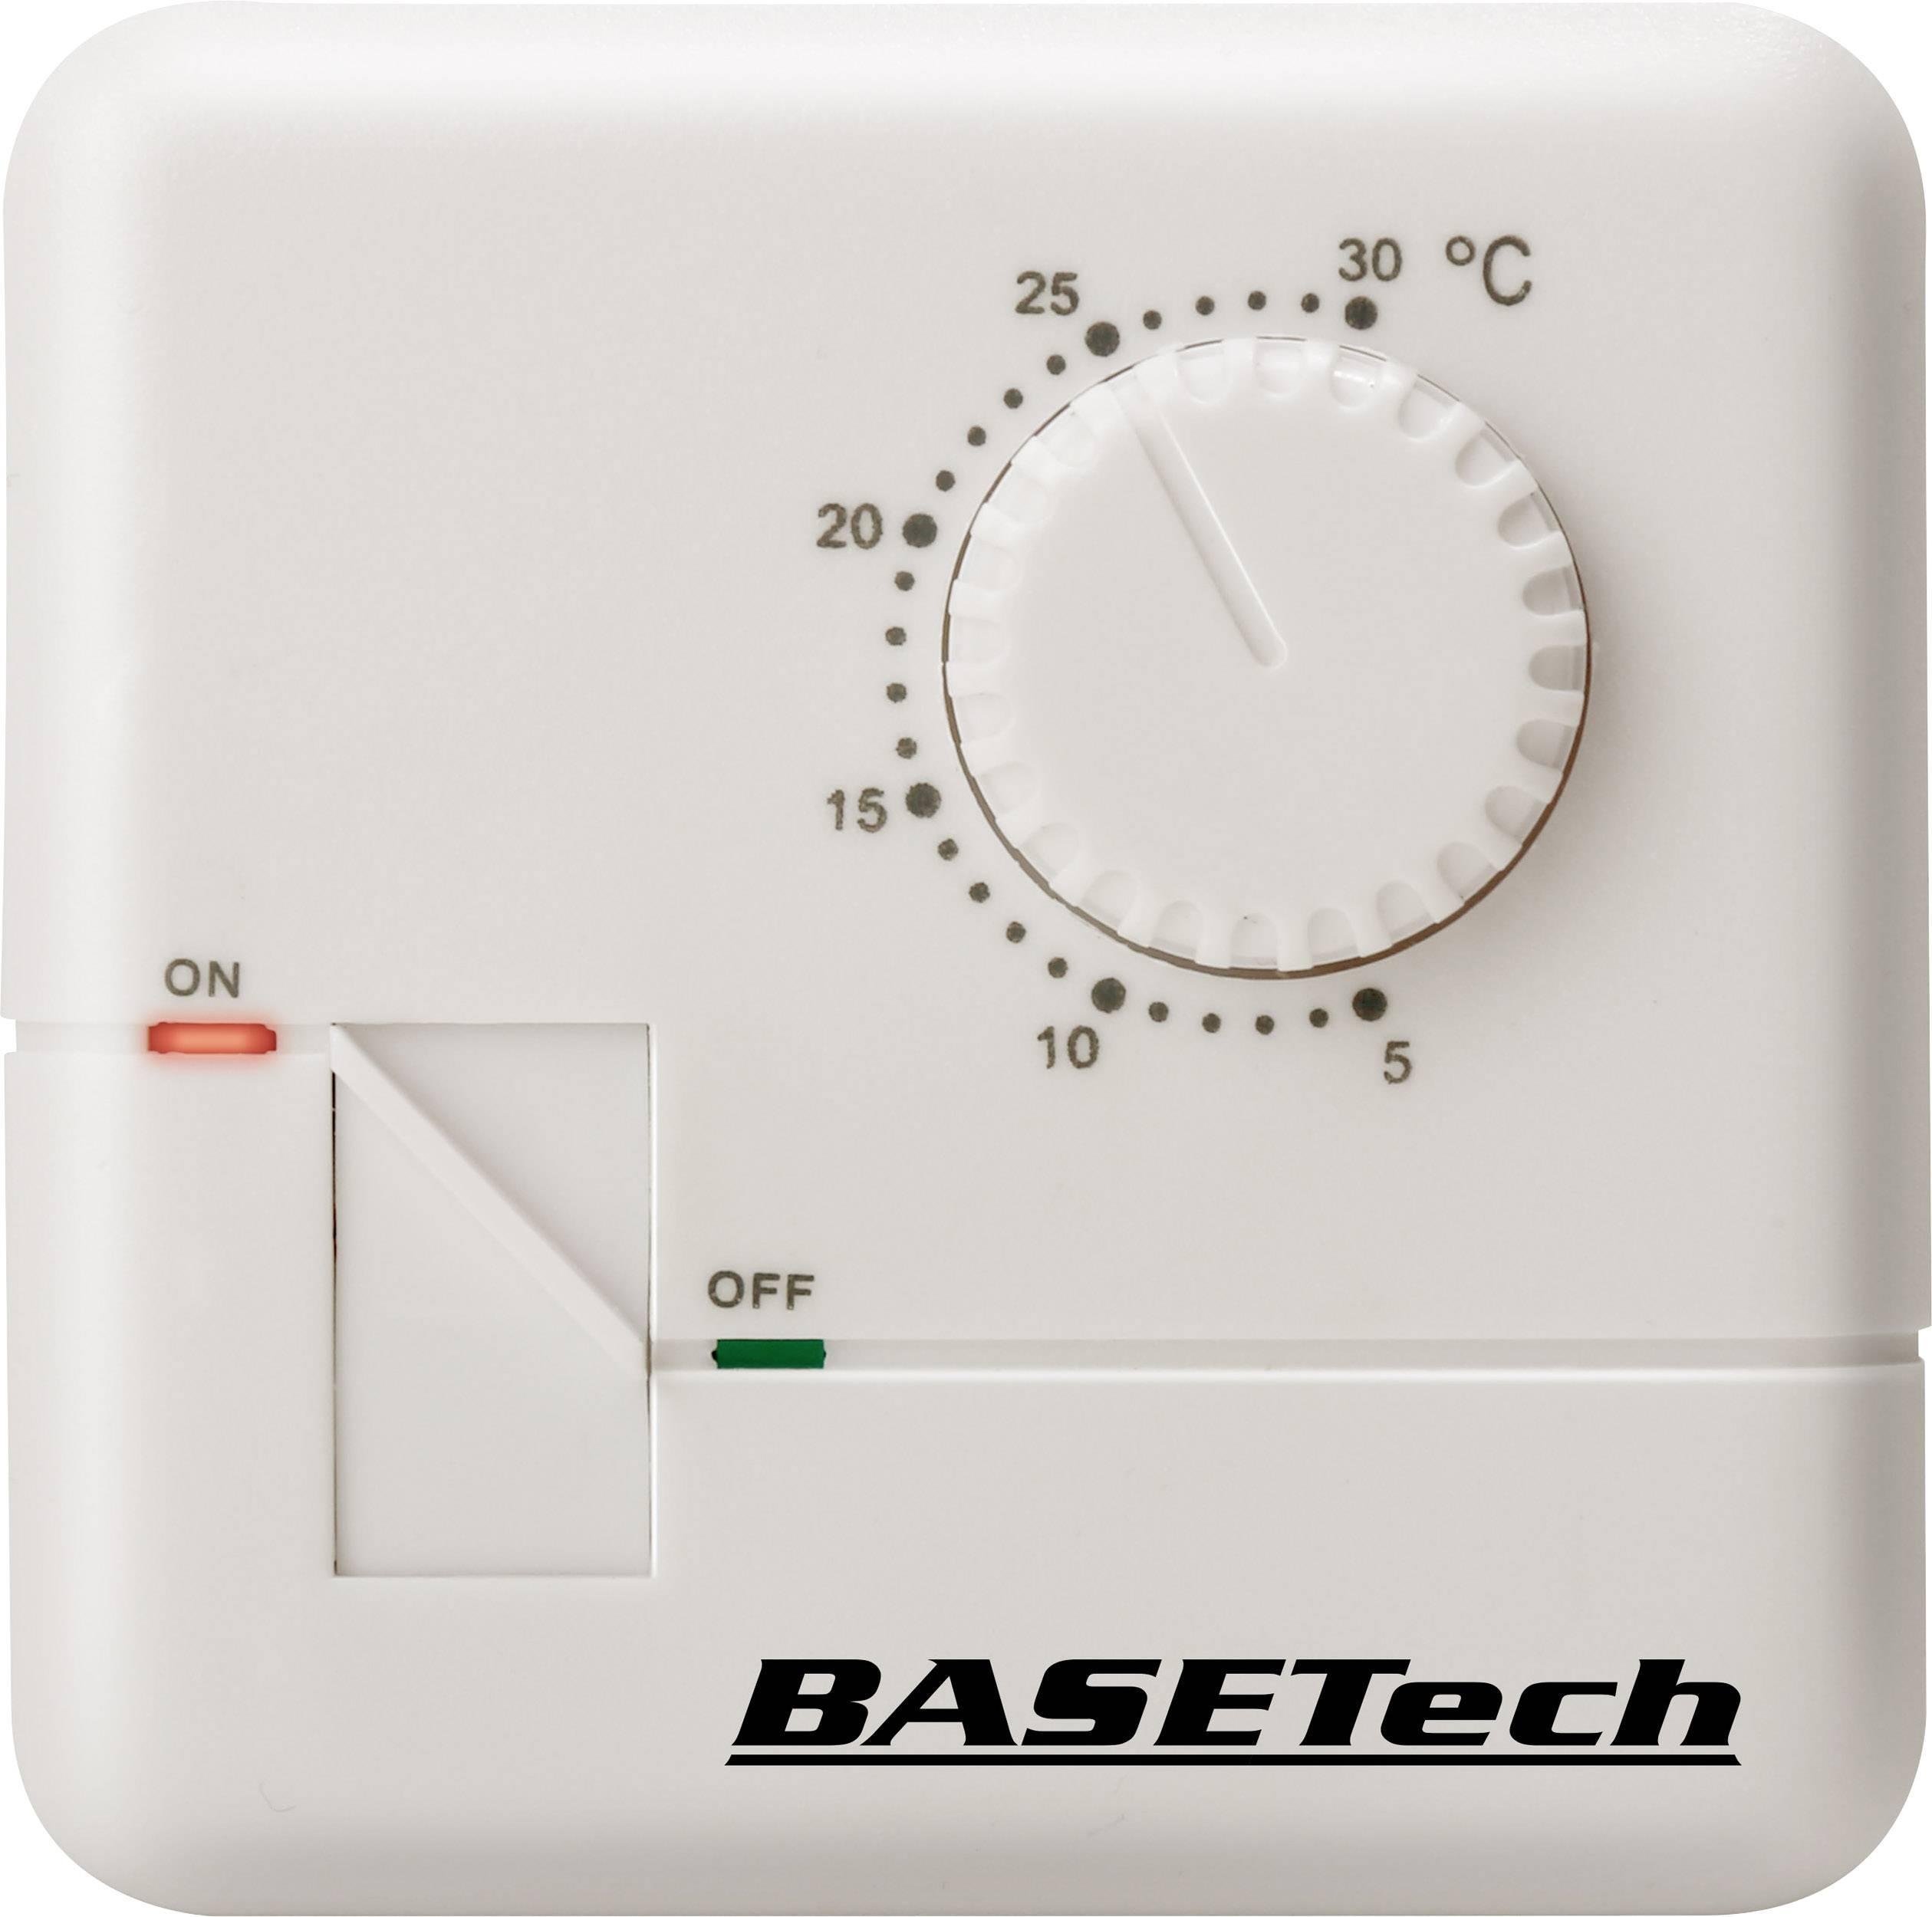 Izbový termostat Basetech MH-555C, denný program, výstavba, 5 do 30 °C